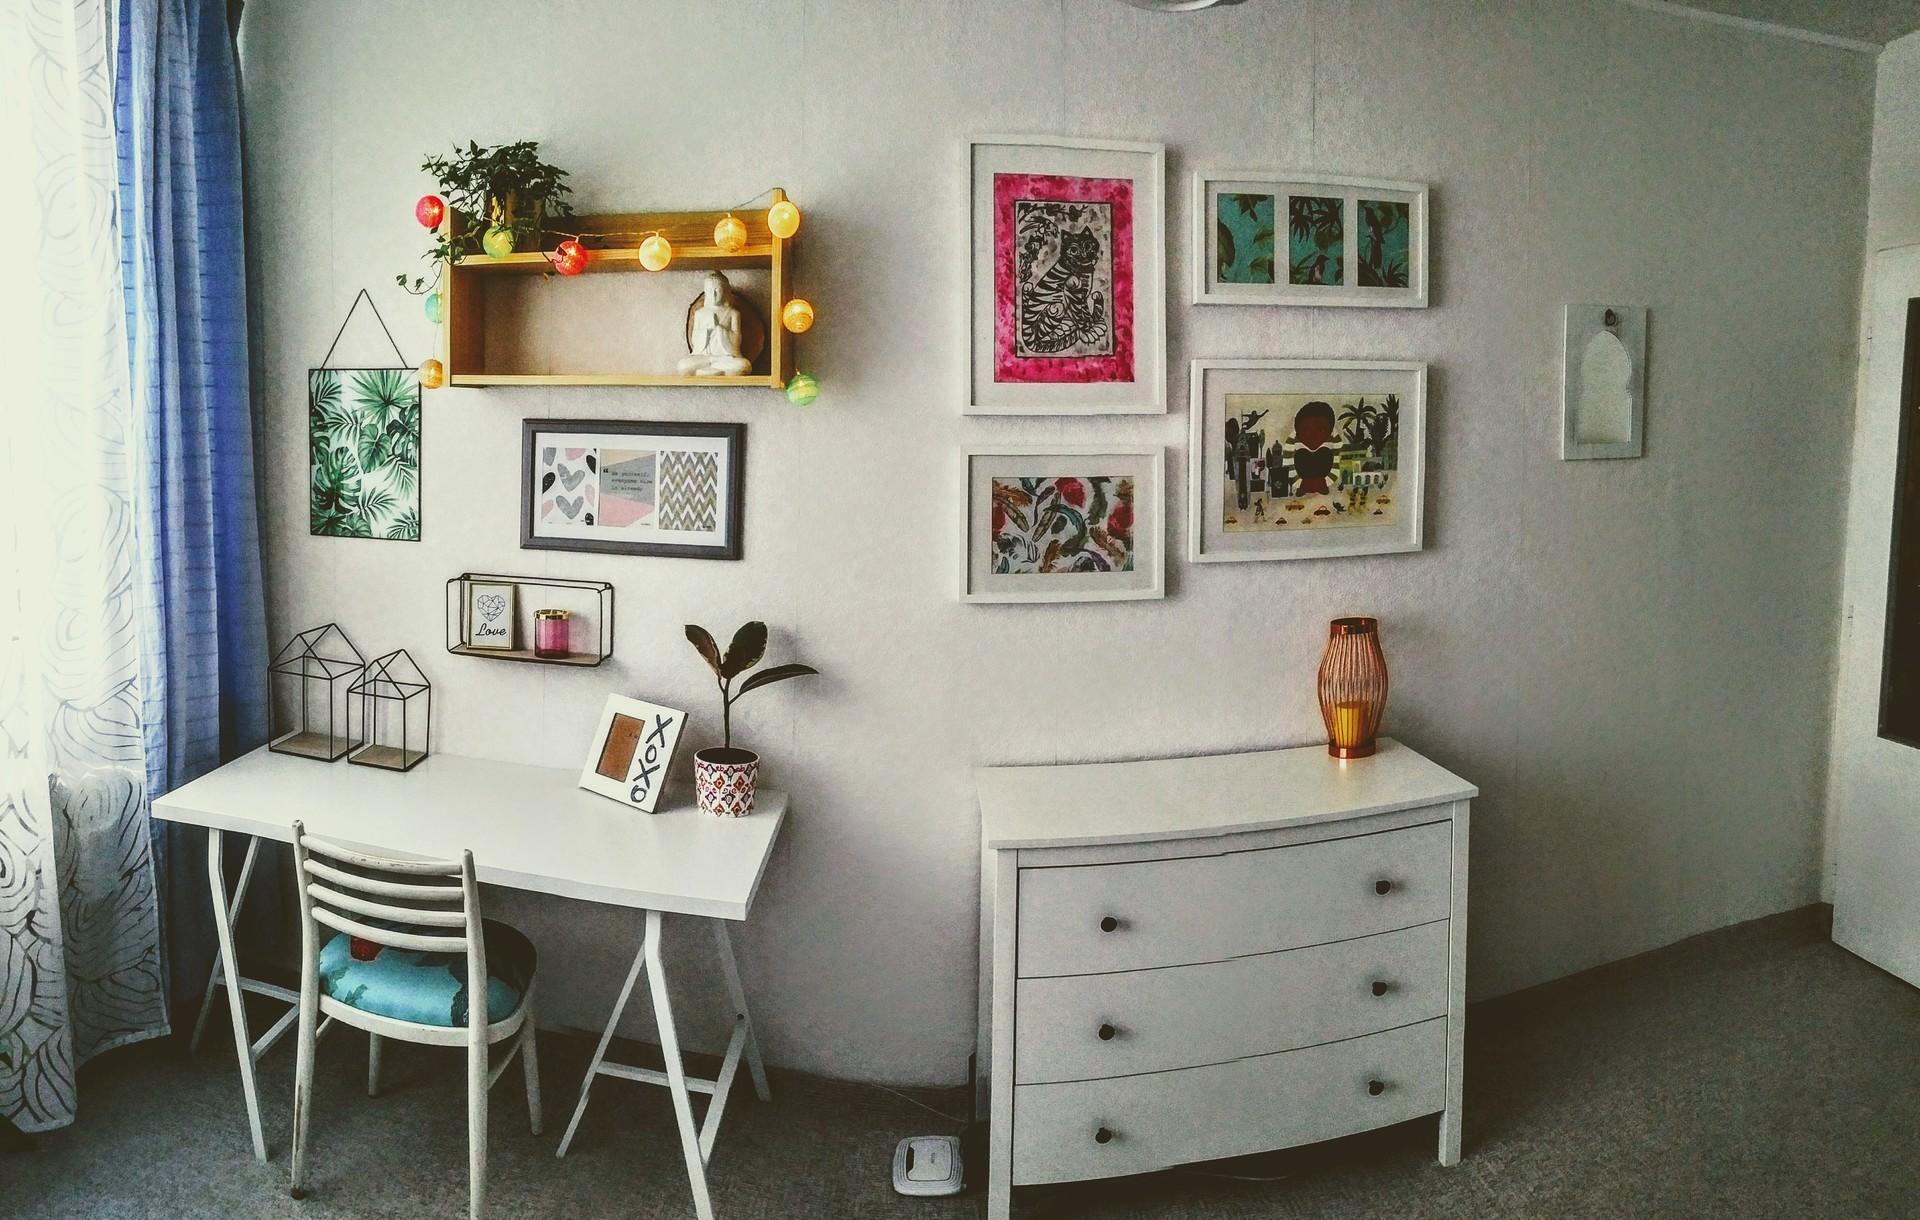 nice-quiet-clean-room-rent-2e0633c62f4b8d4ca925aea907ce416e